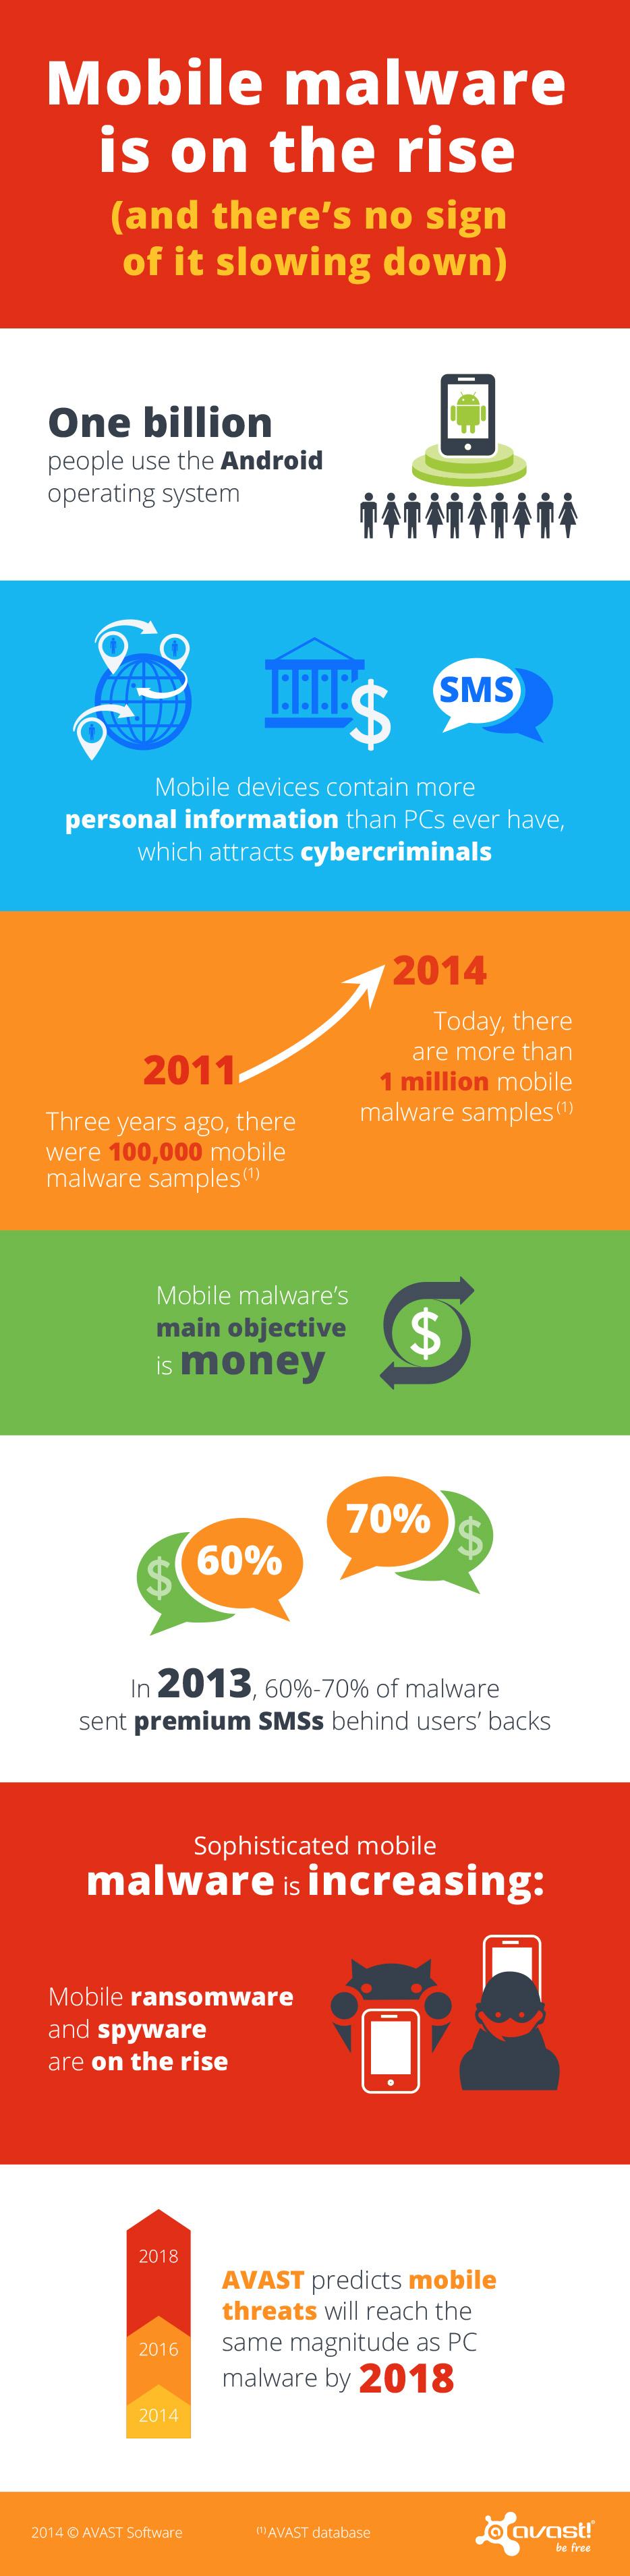 AVAST Mobile Malware infographic